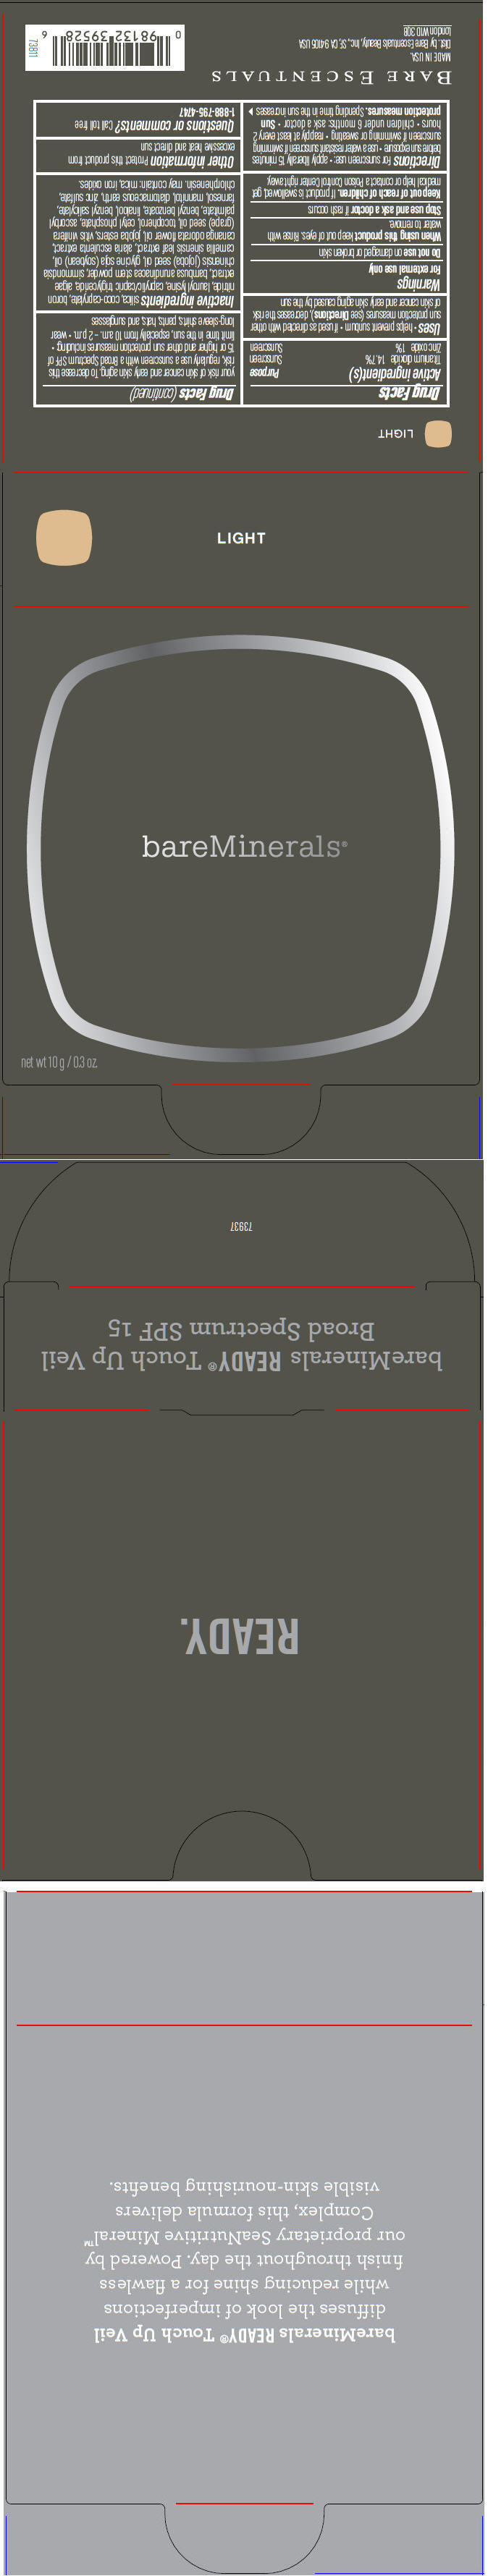 Principal Display Panel - 10 g Tray Carton - Light